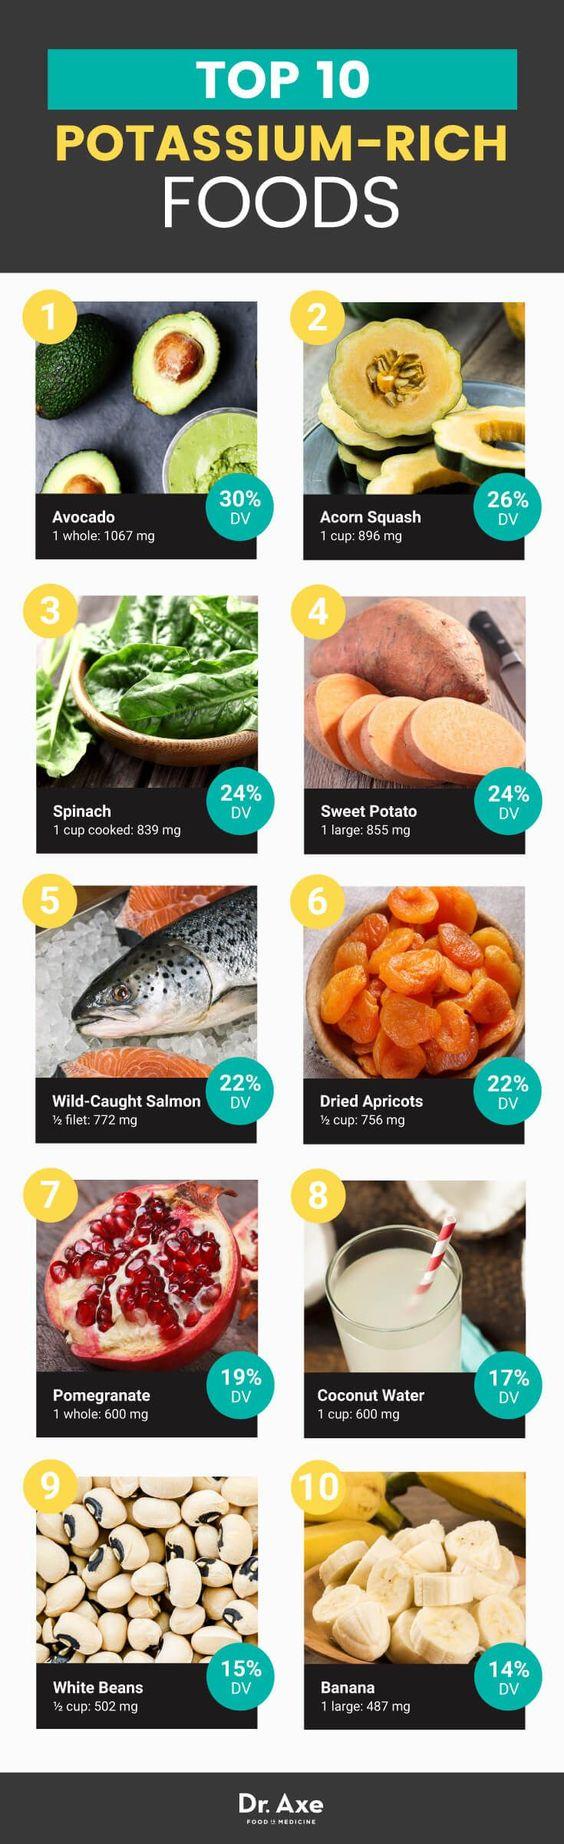 Top 10 potassium-rich foods - Dr. Axe